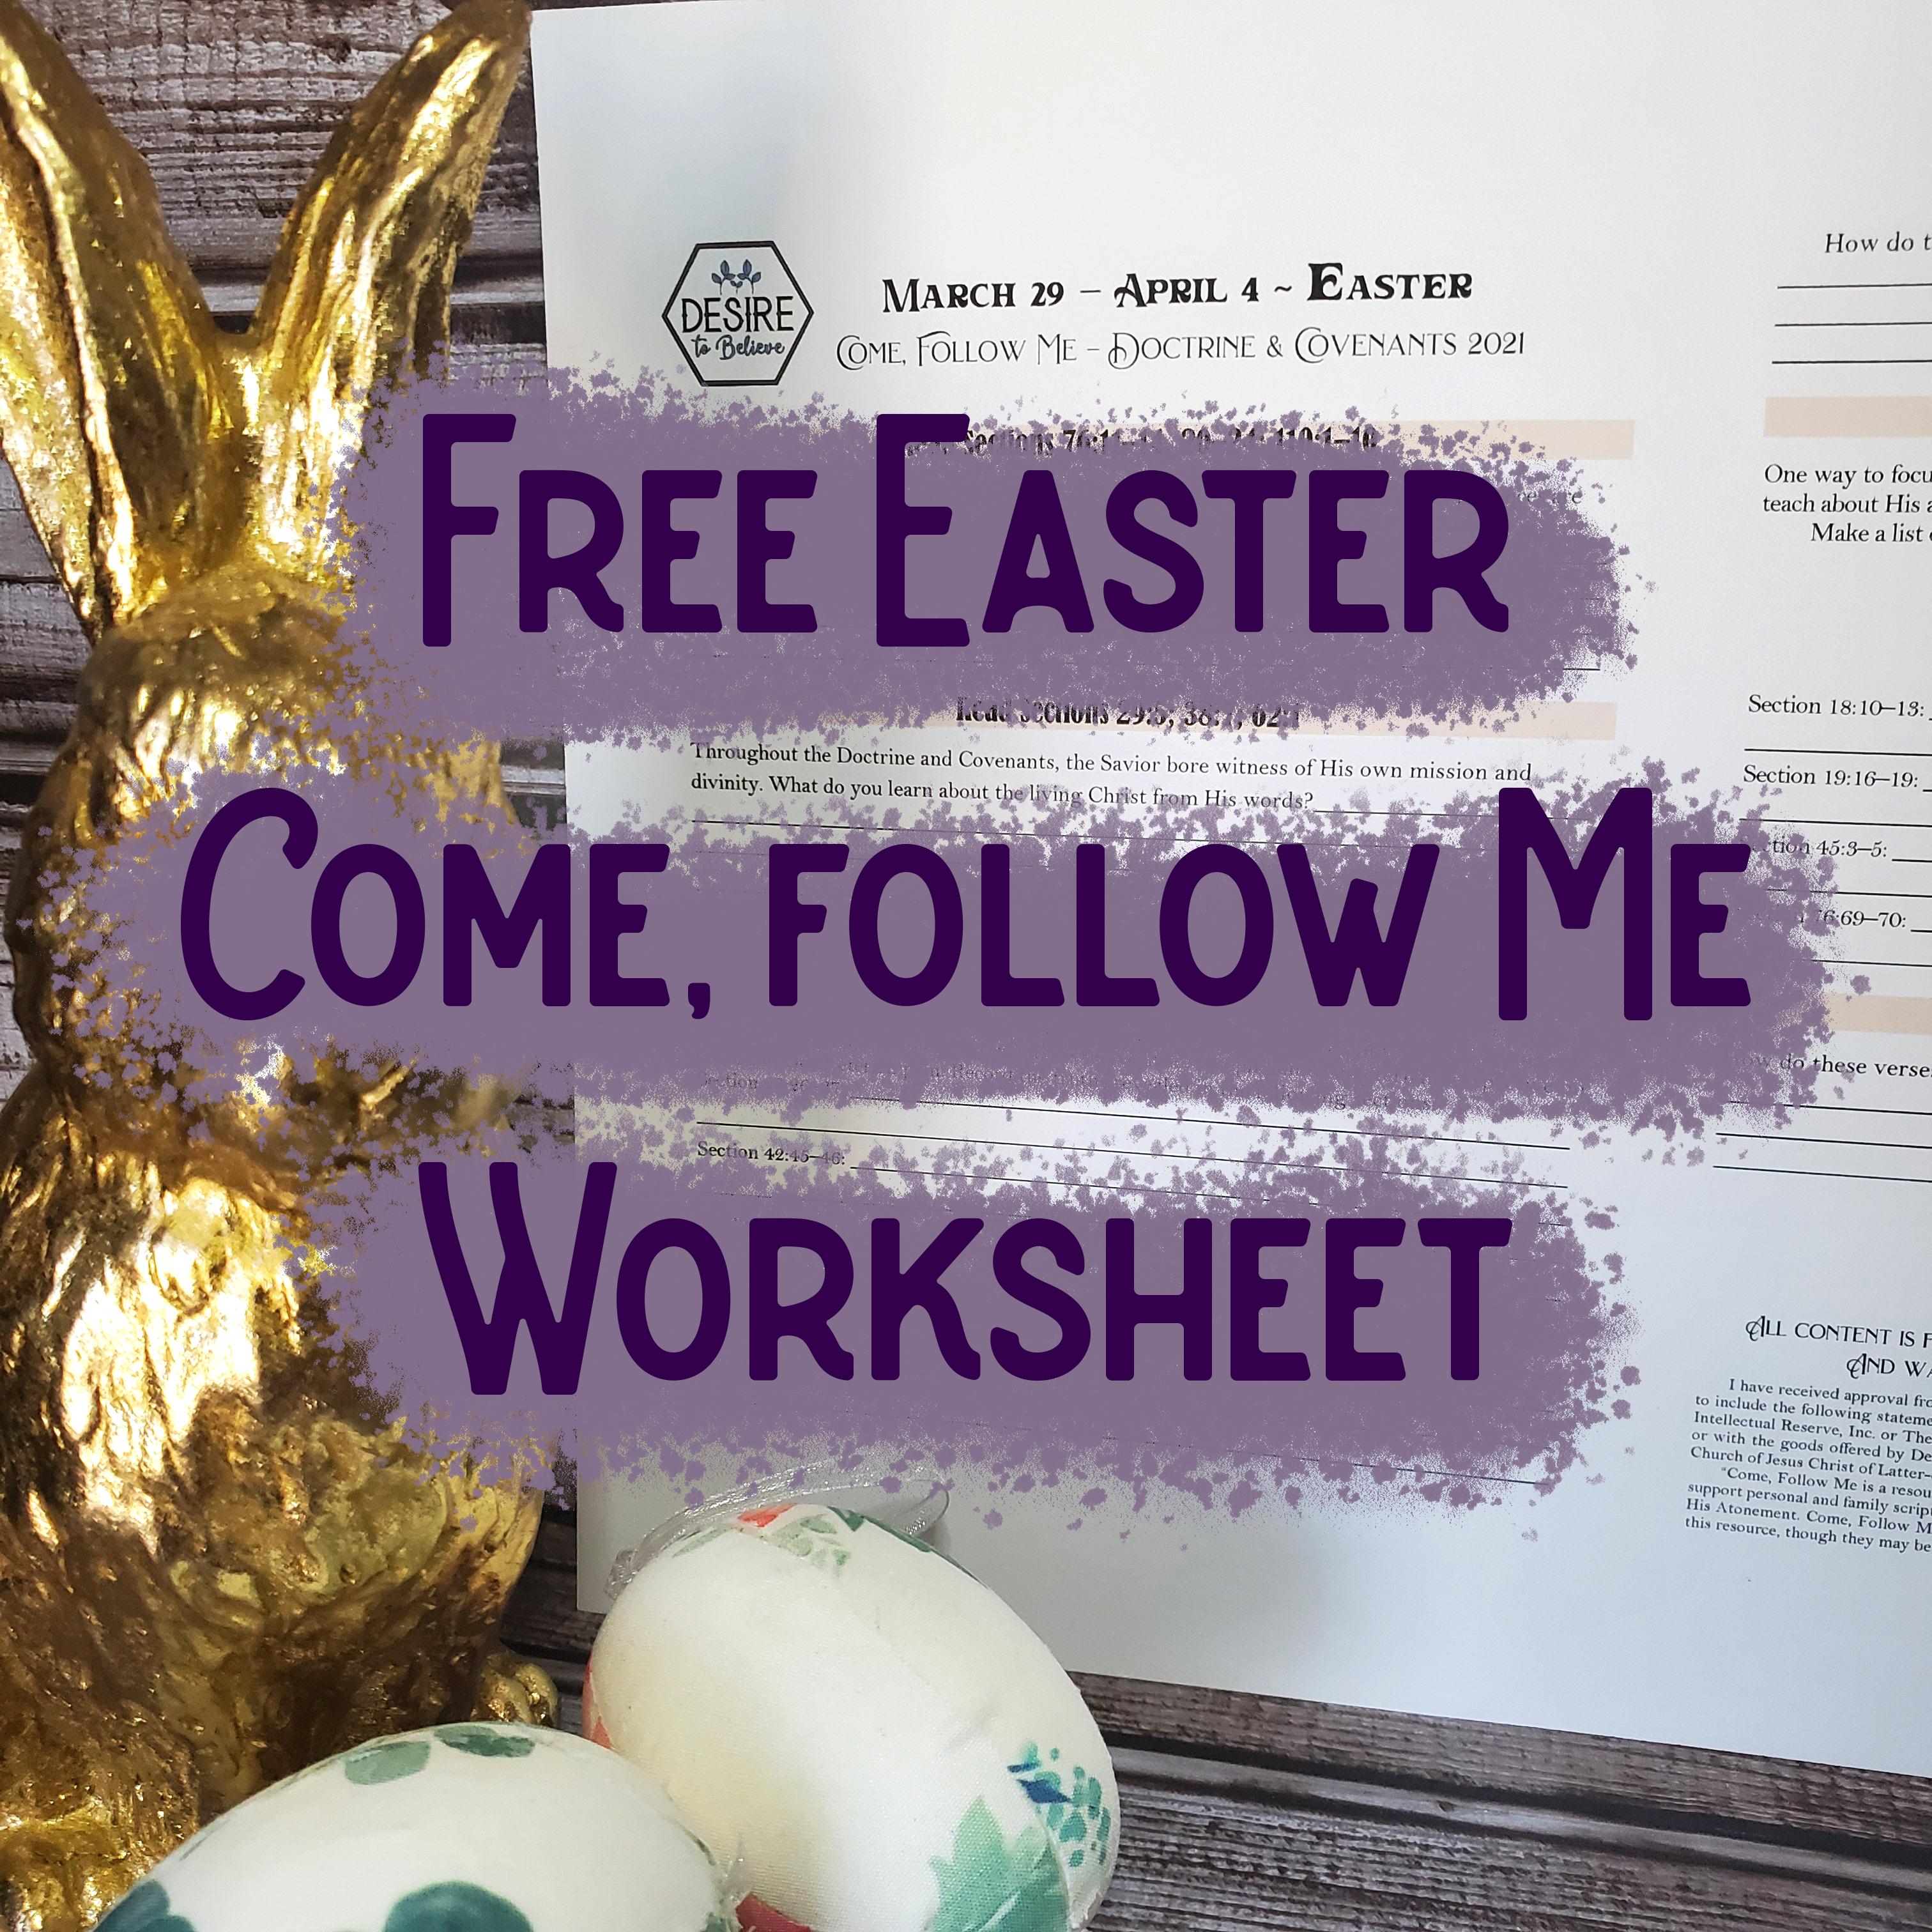 Easter 2021 Worksheet